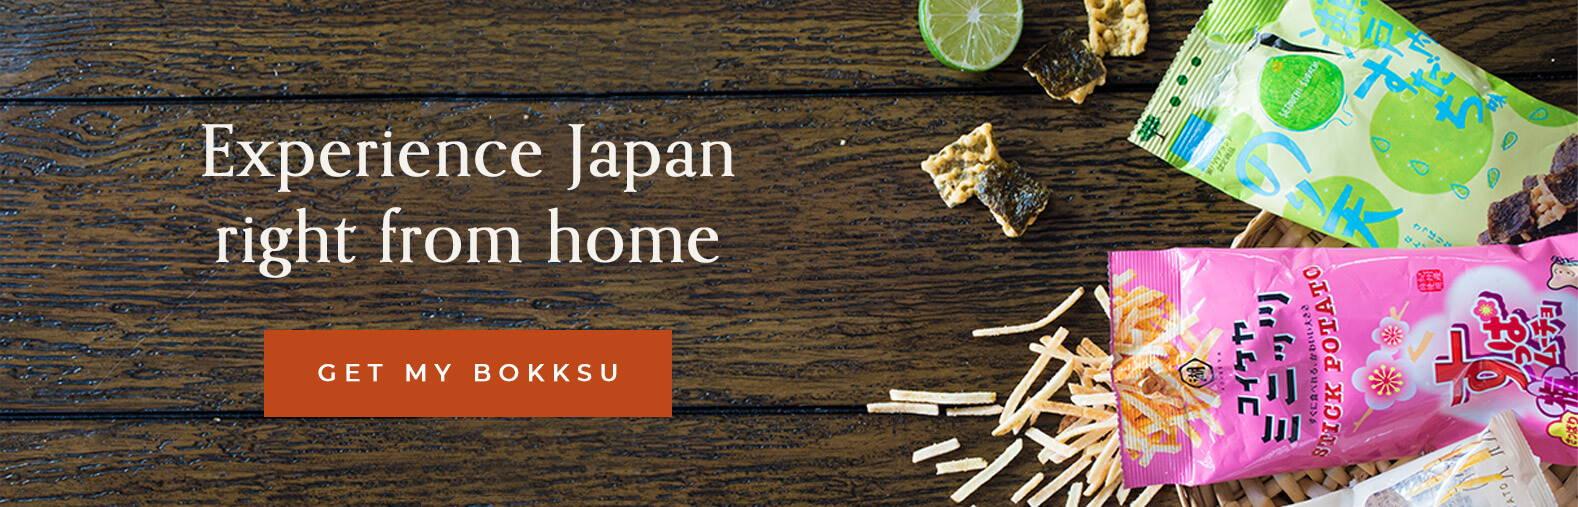 join Bokksu japanese snacks subscription box service today